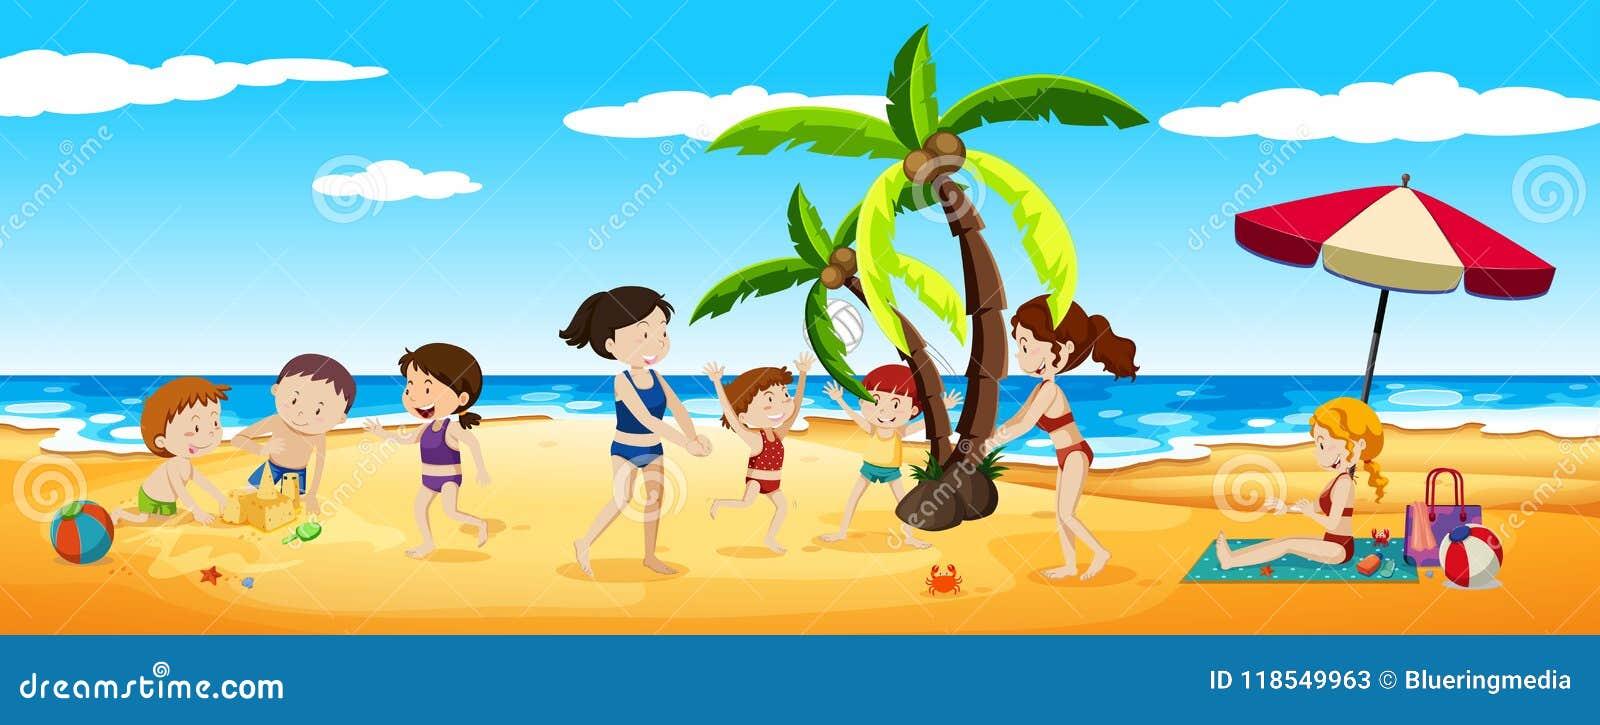 Scene Of People Having Fun At The Beach Stock Vector Illustration